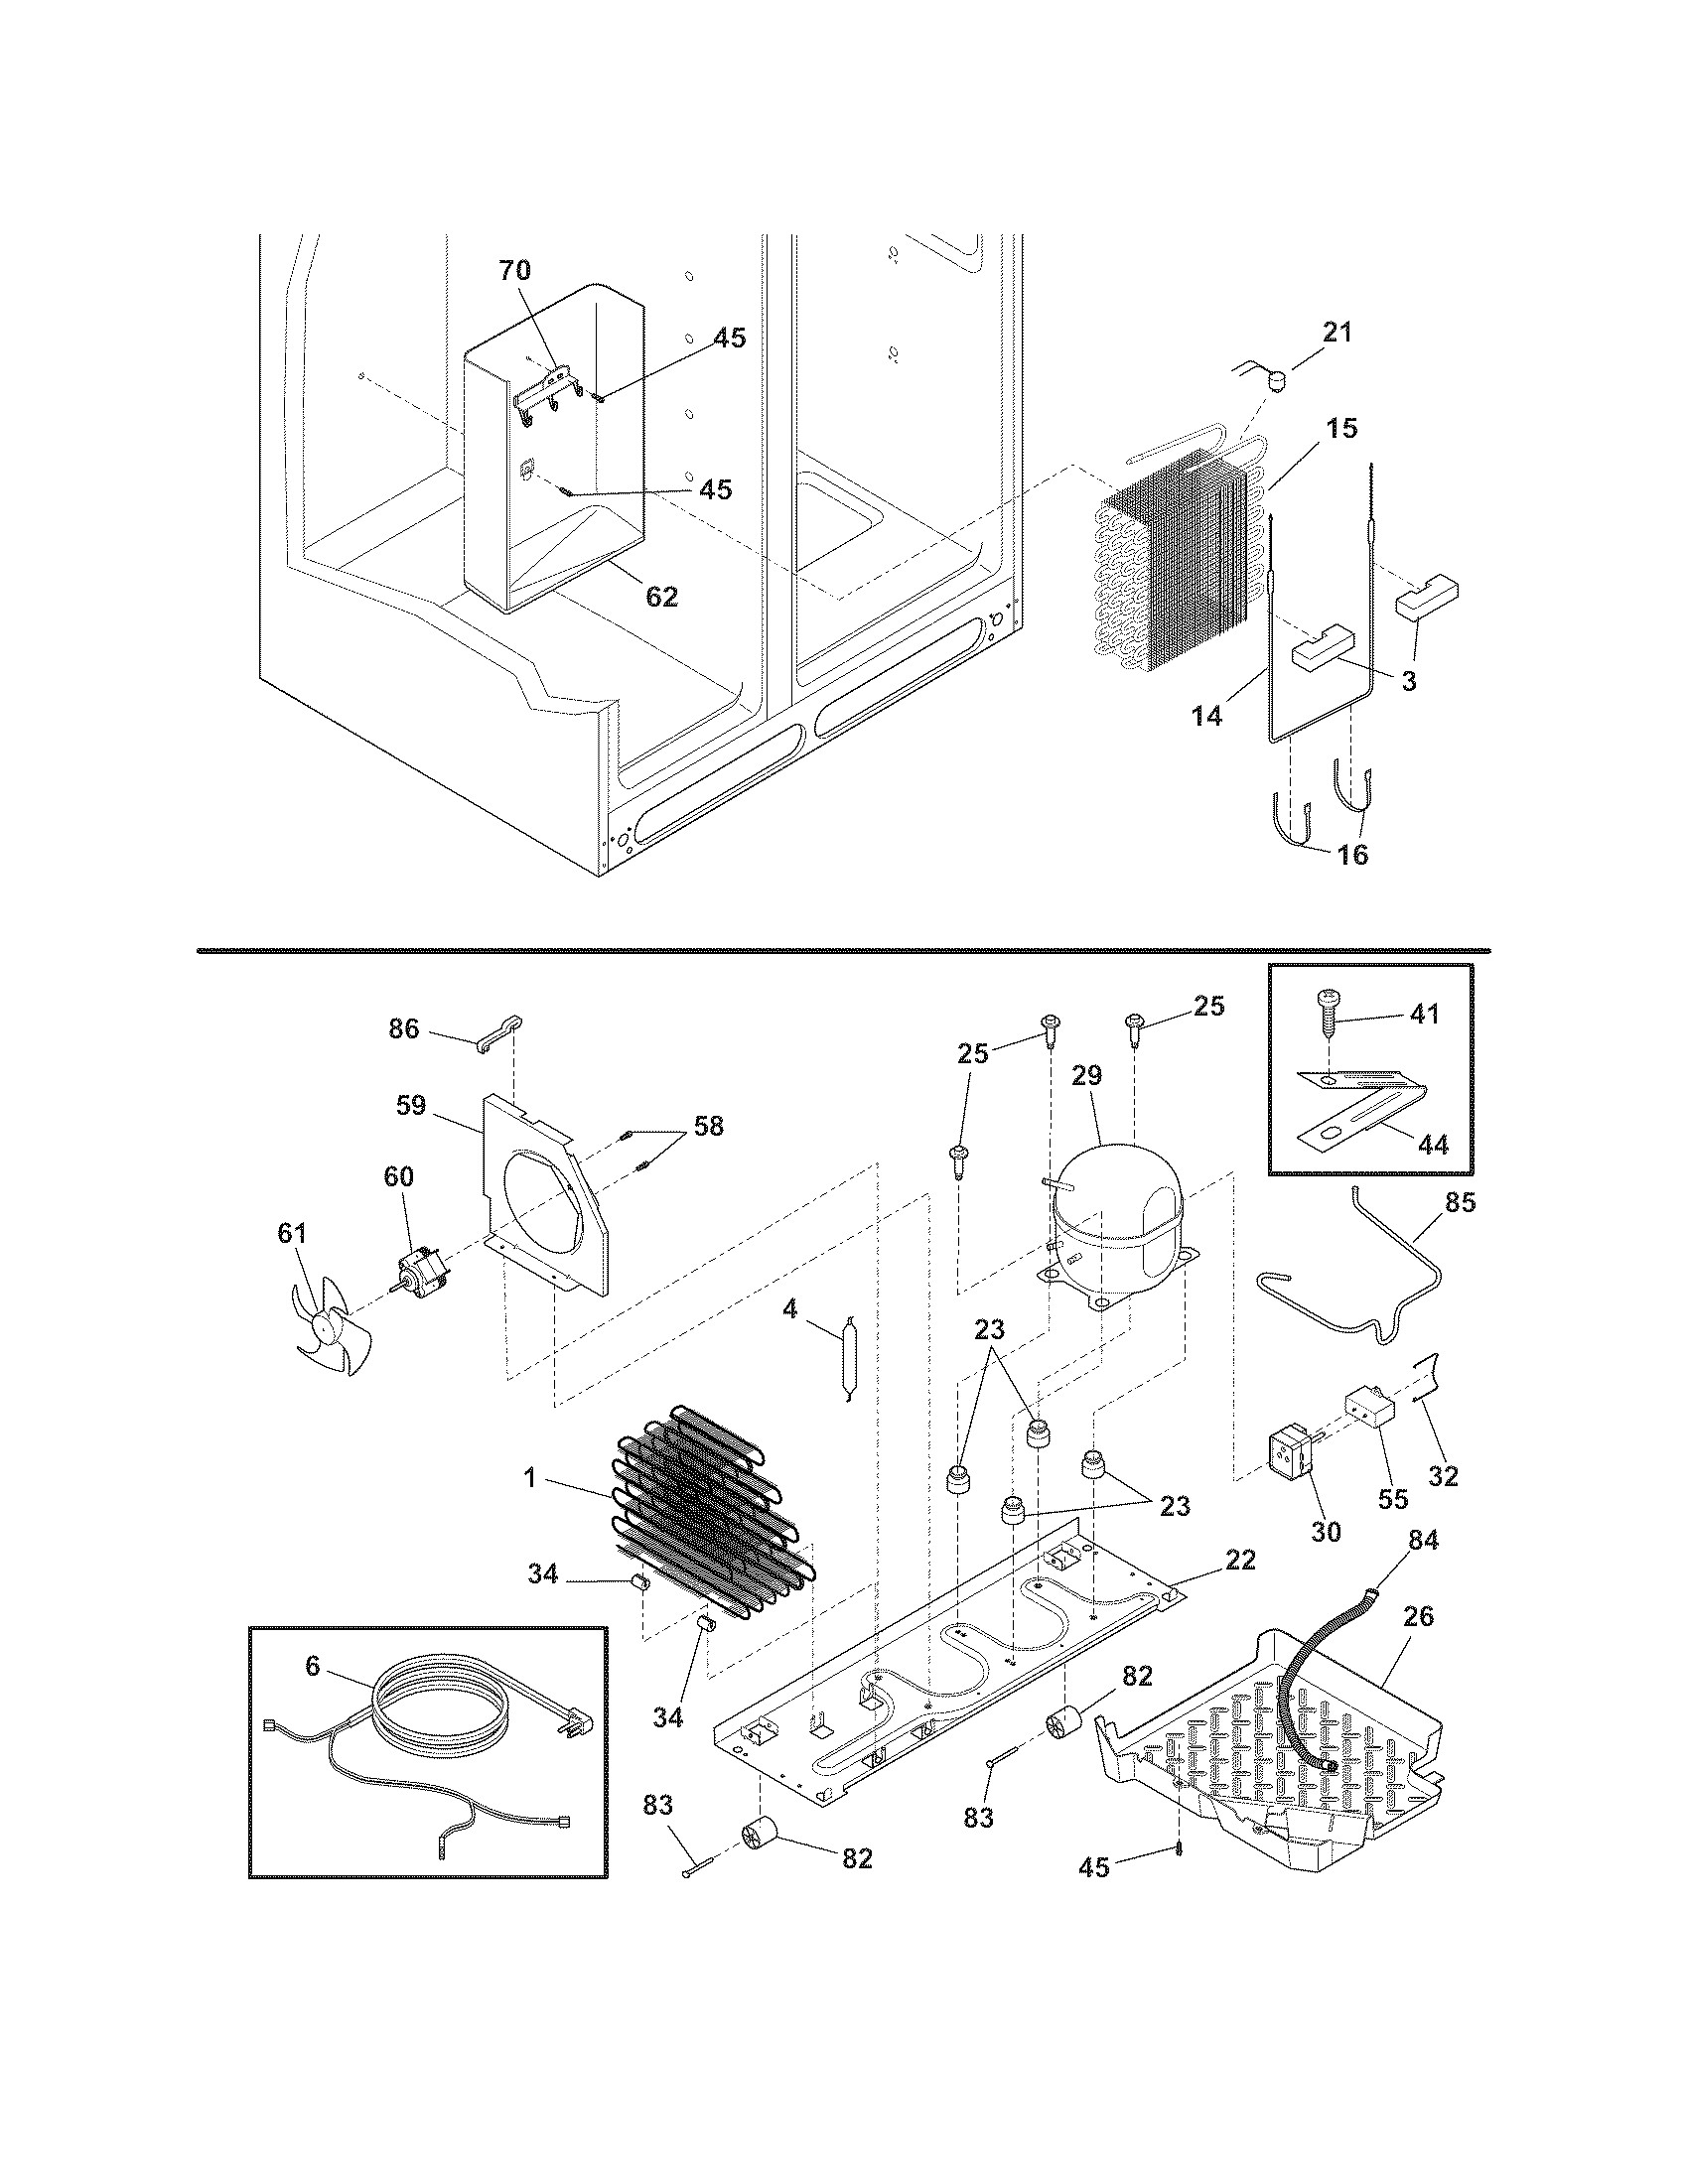 Frigidaire Ice Maker Parts Diagram Charming Maytag Refrigerator Wiring Schematic Model Ffss2614qs0 Side By Genuine Of